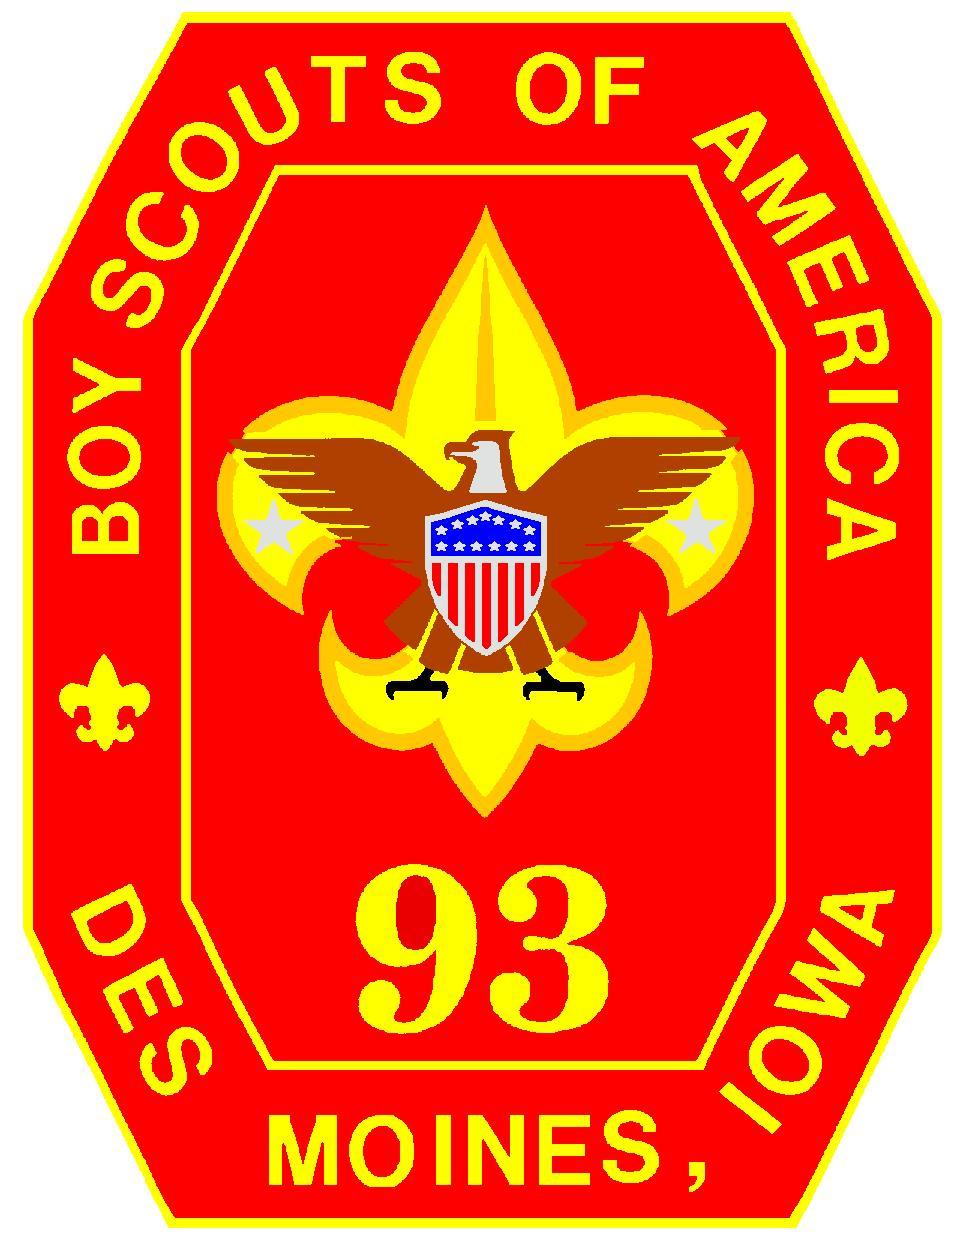 Troop 93 BSA is chartered by:  Douglas Avenue Presbyterian Church.   4601 Douglas Des Moines, IA  50310  http://www.troop93.org